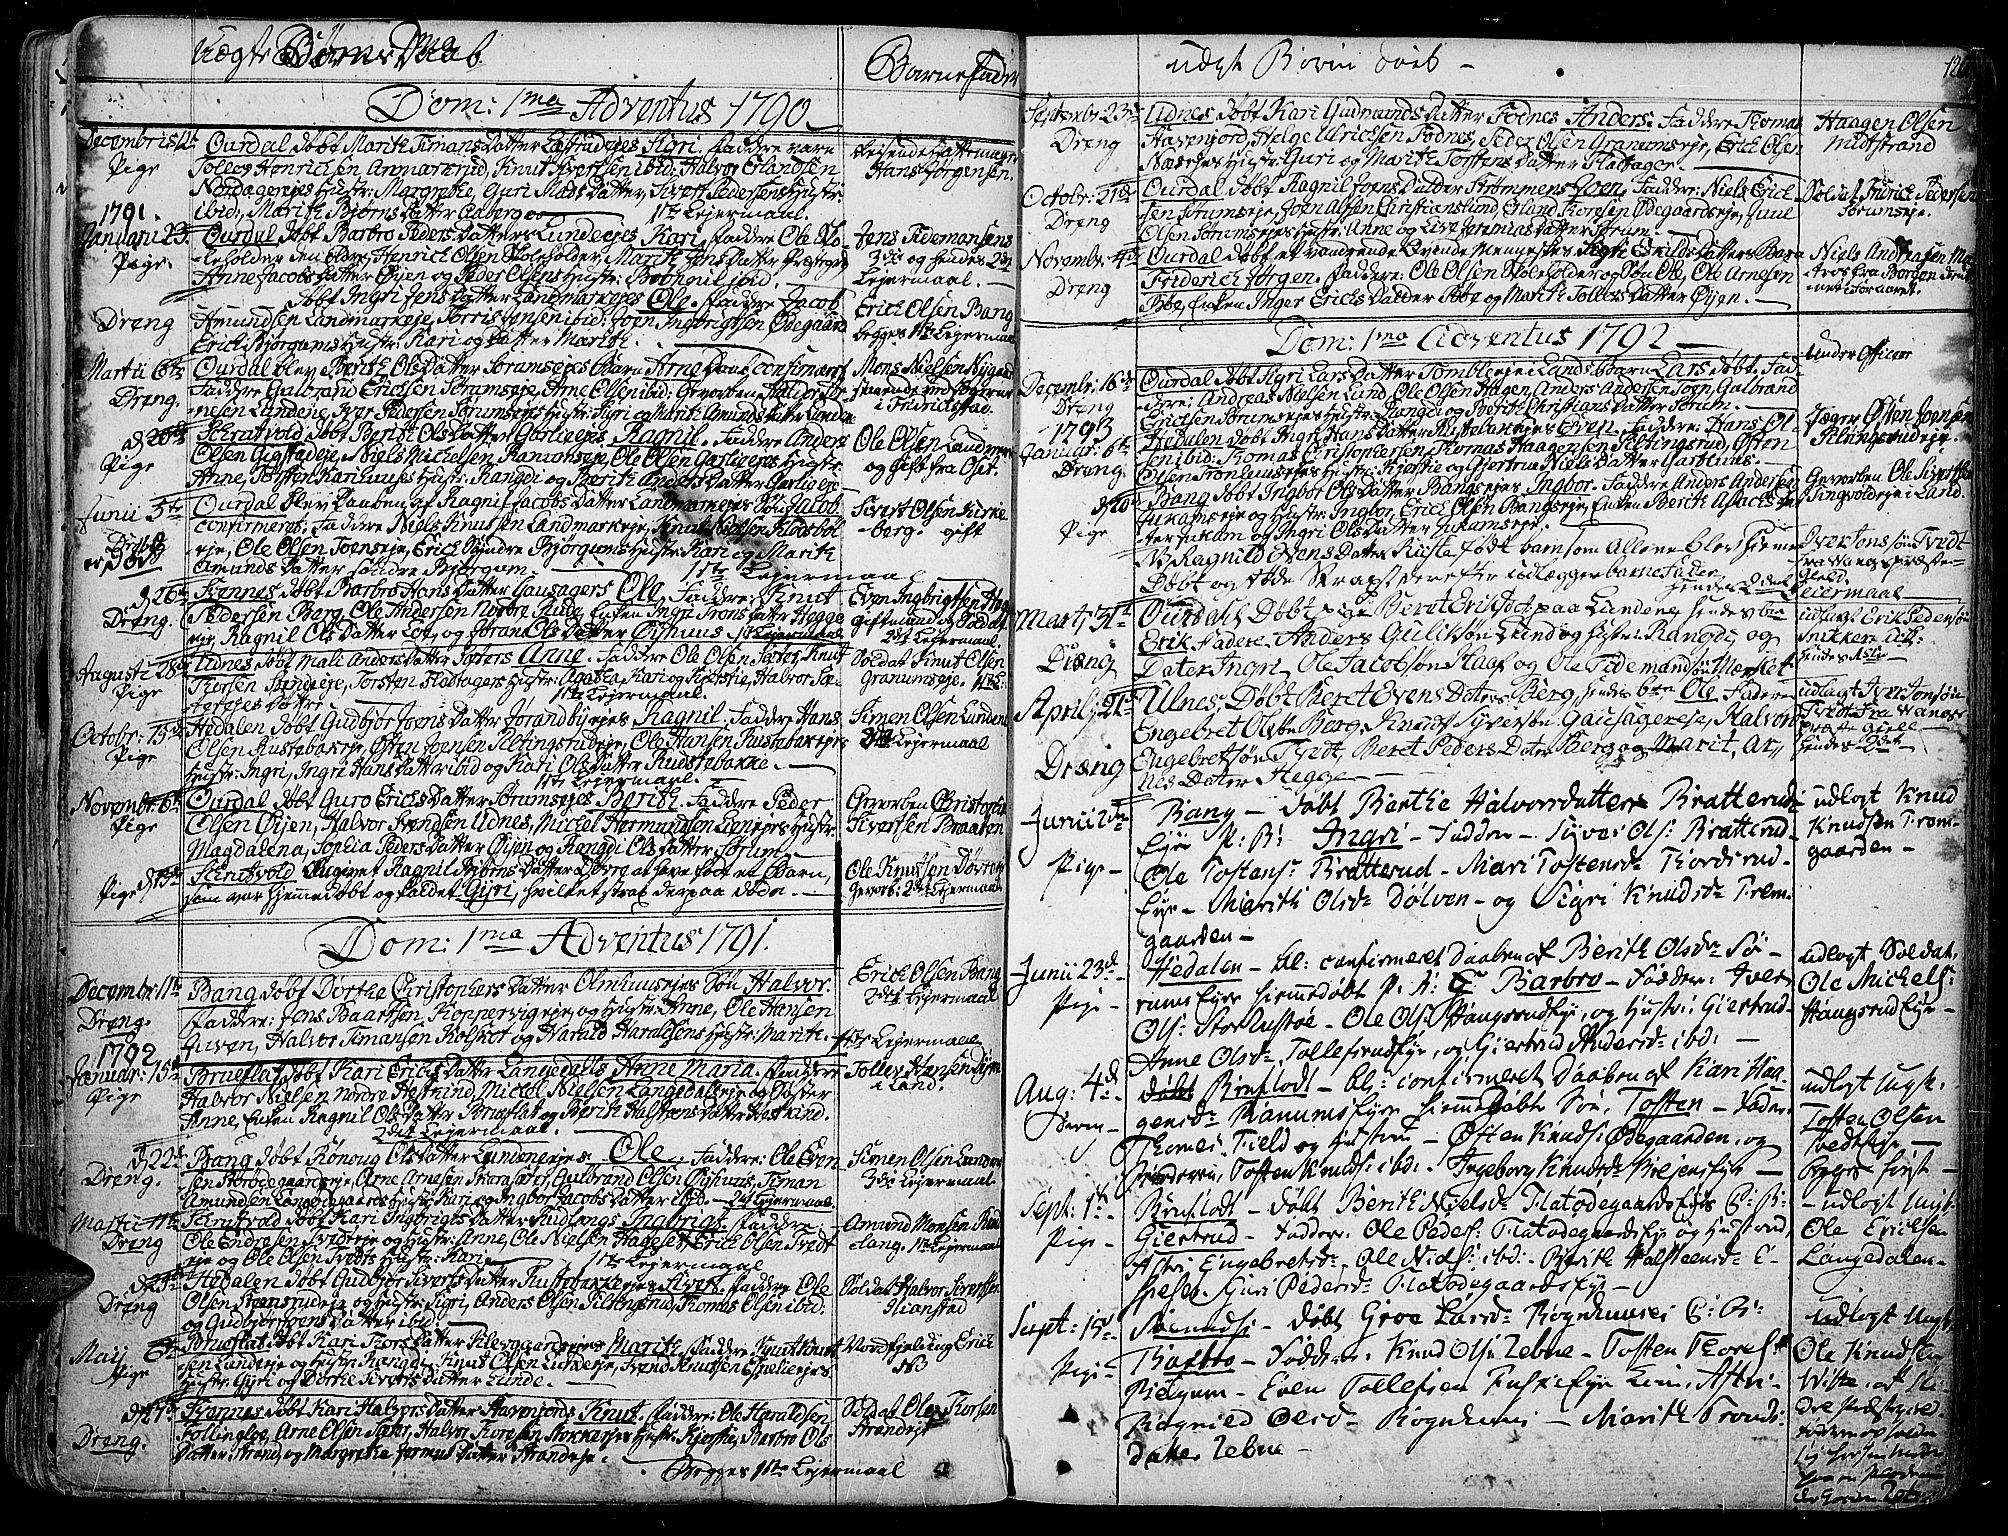 SAH, Aurdal prestekontor, Ministerialbok nr. 6, 1781-1804, s. 126